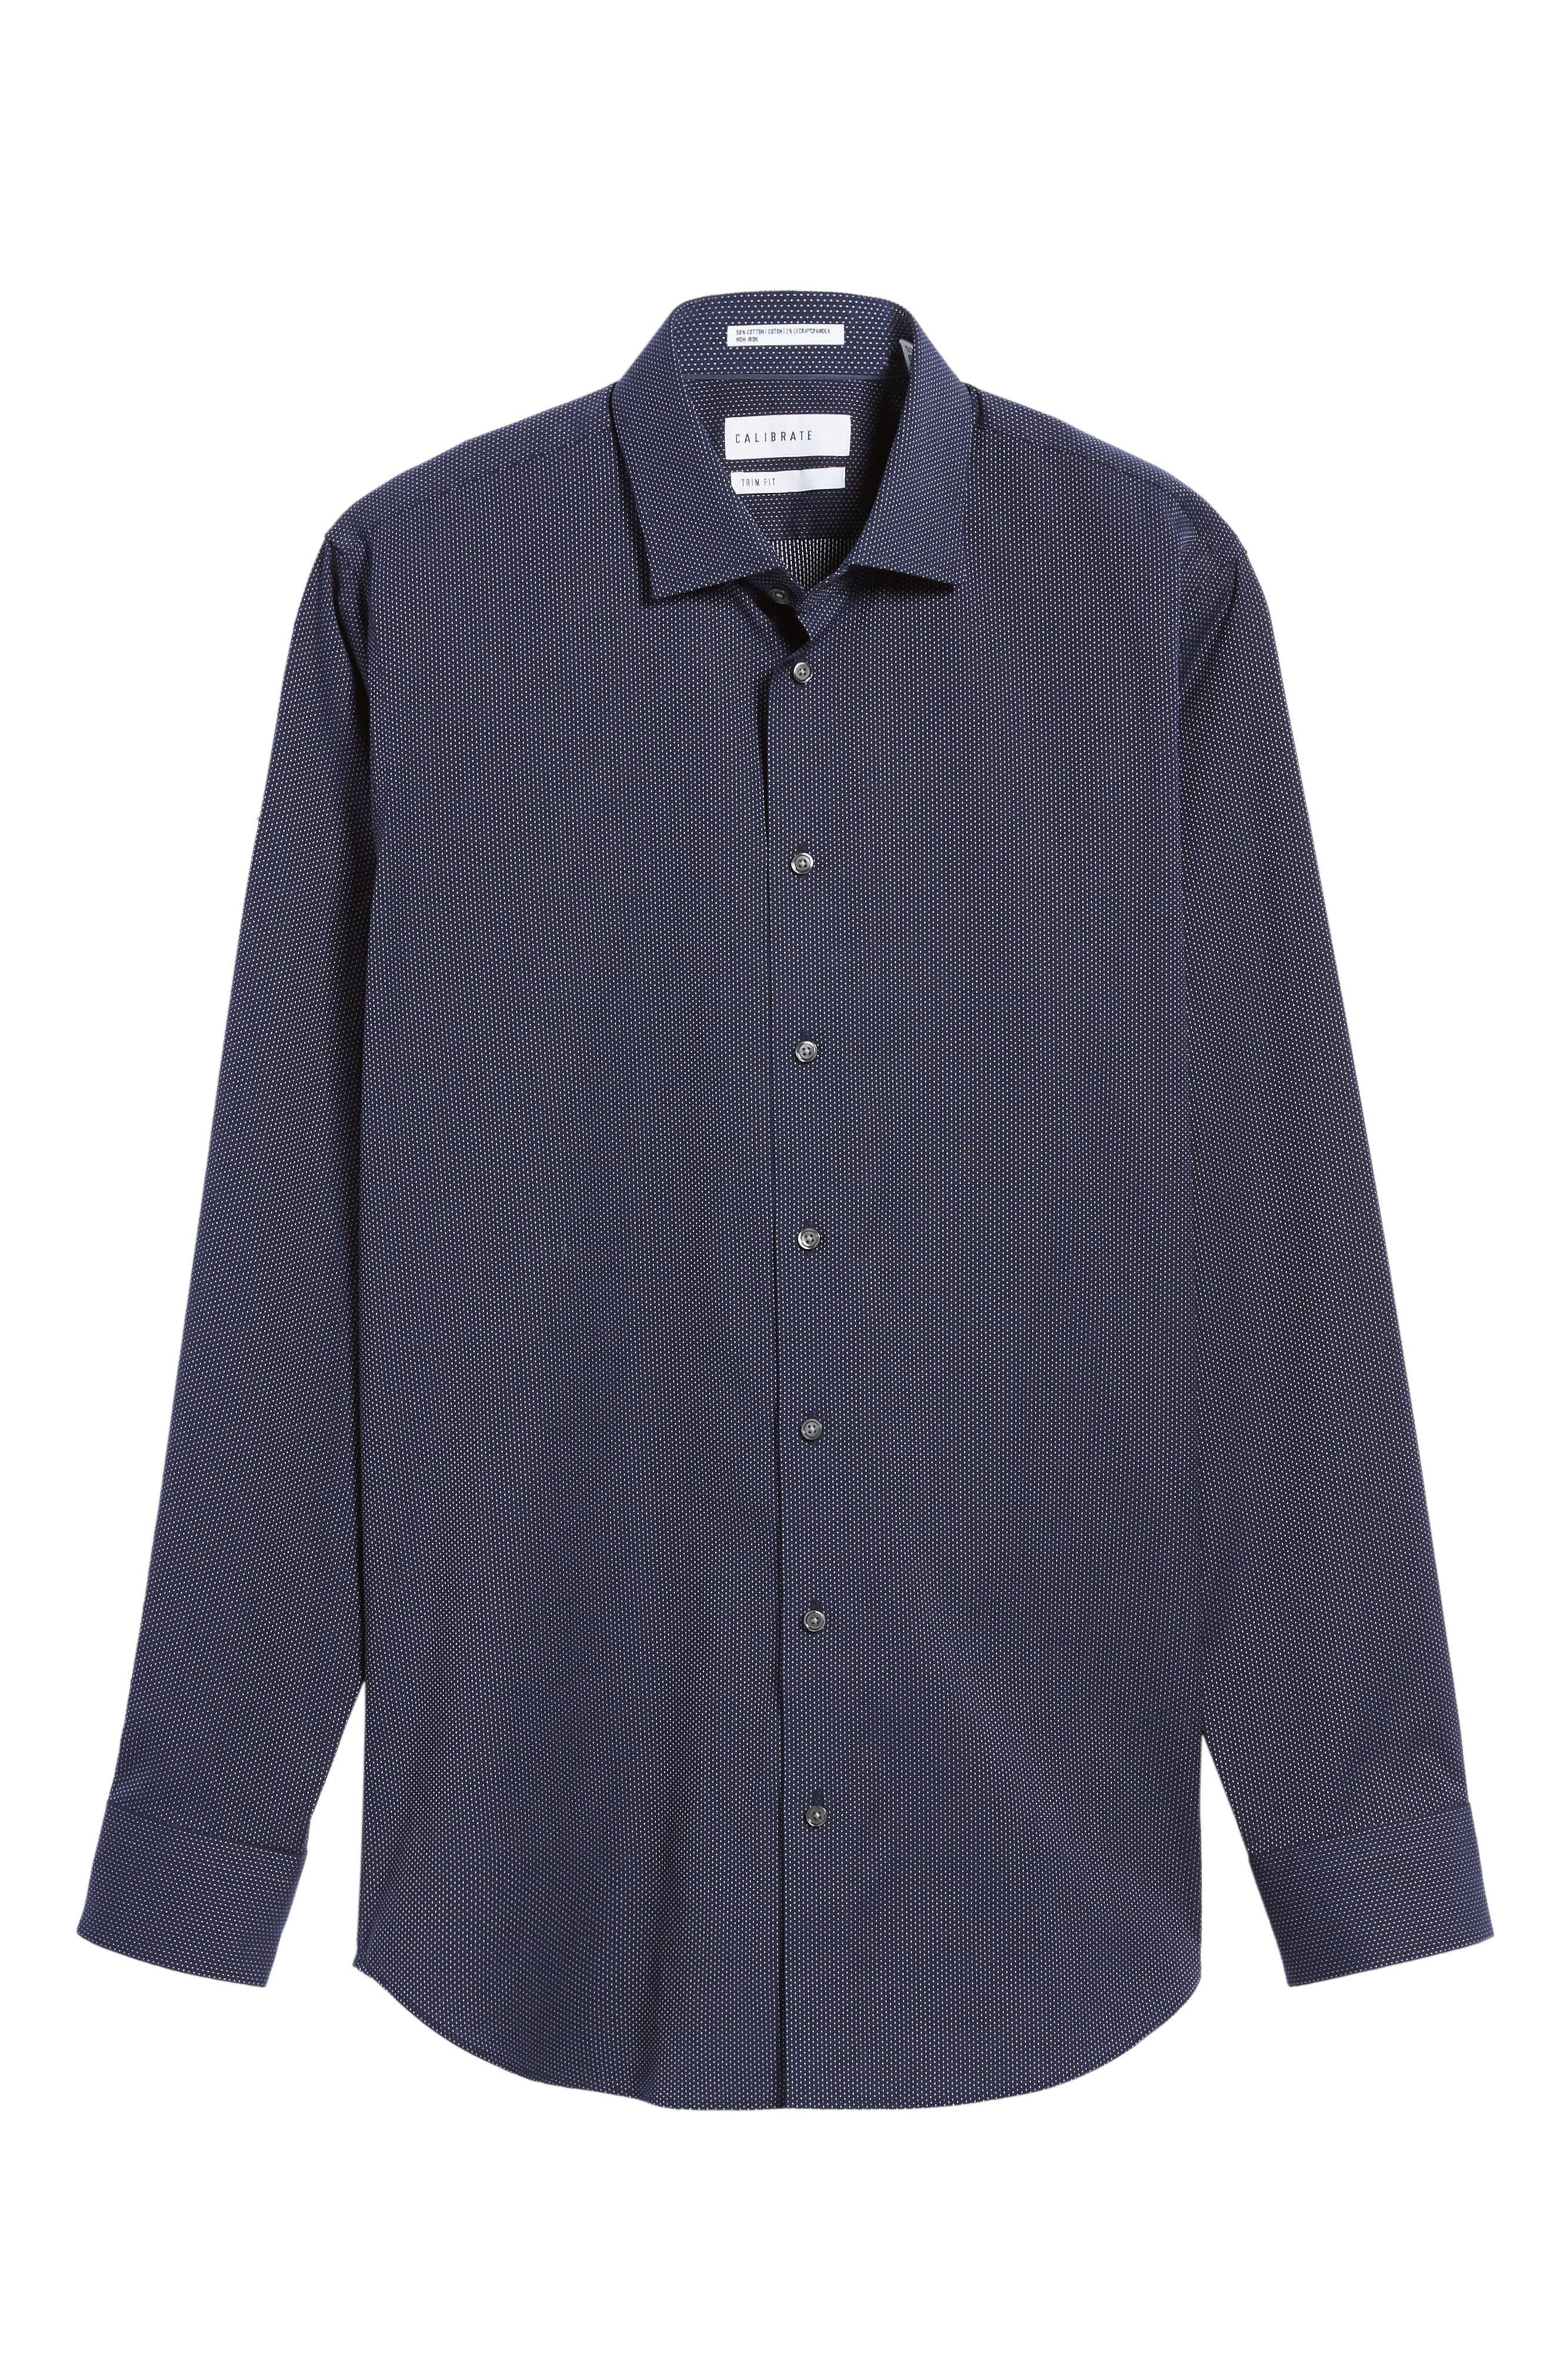 Trim Fit Non-Iron Microdot Dress Shirt,                             Alternate thumbnail 3, color,                             401